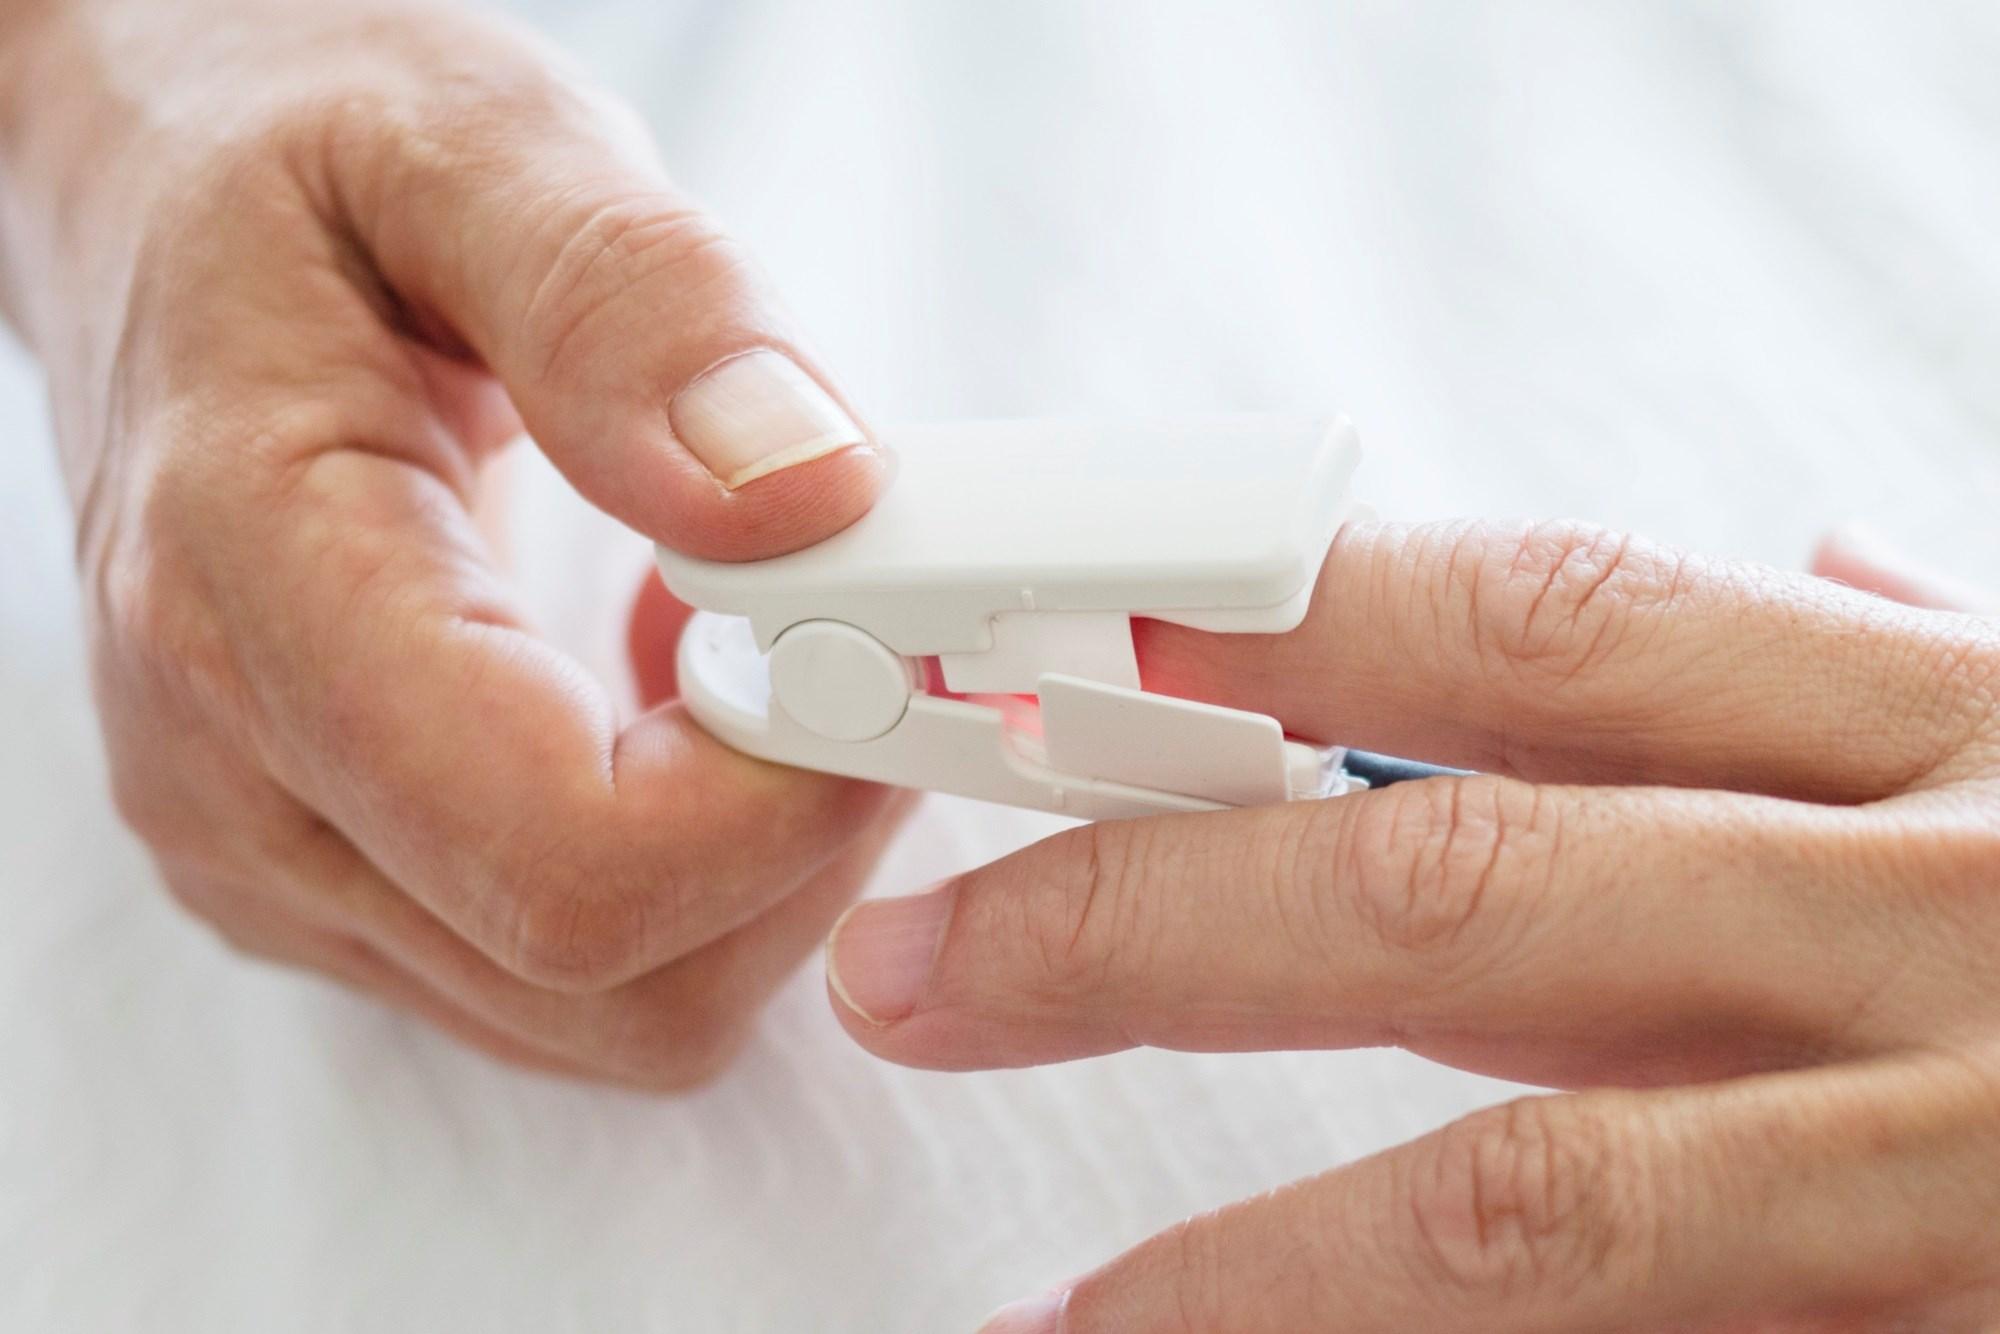 STOP-Bang, Pulse Oximetry Effective Screening Tools for Sleep Apnea